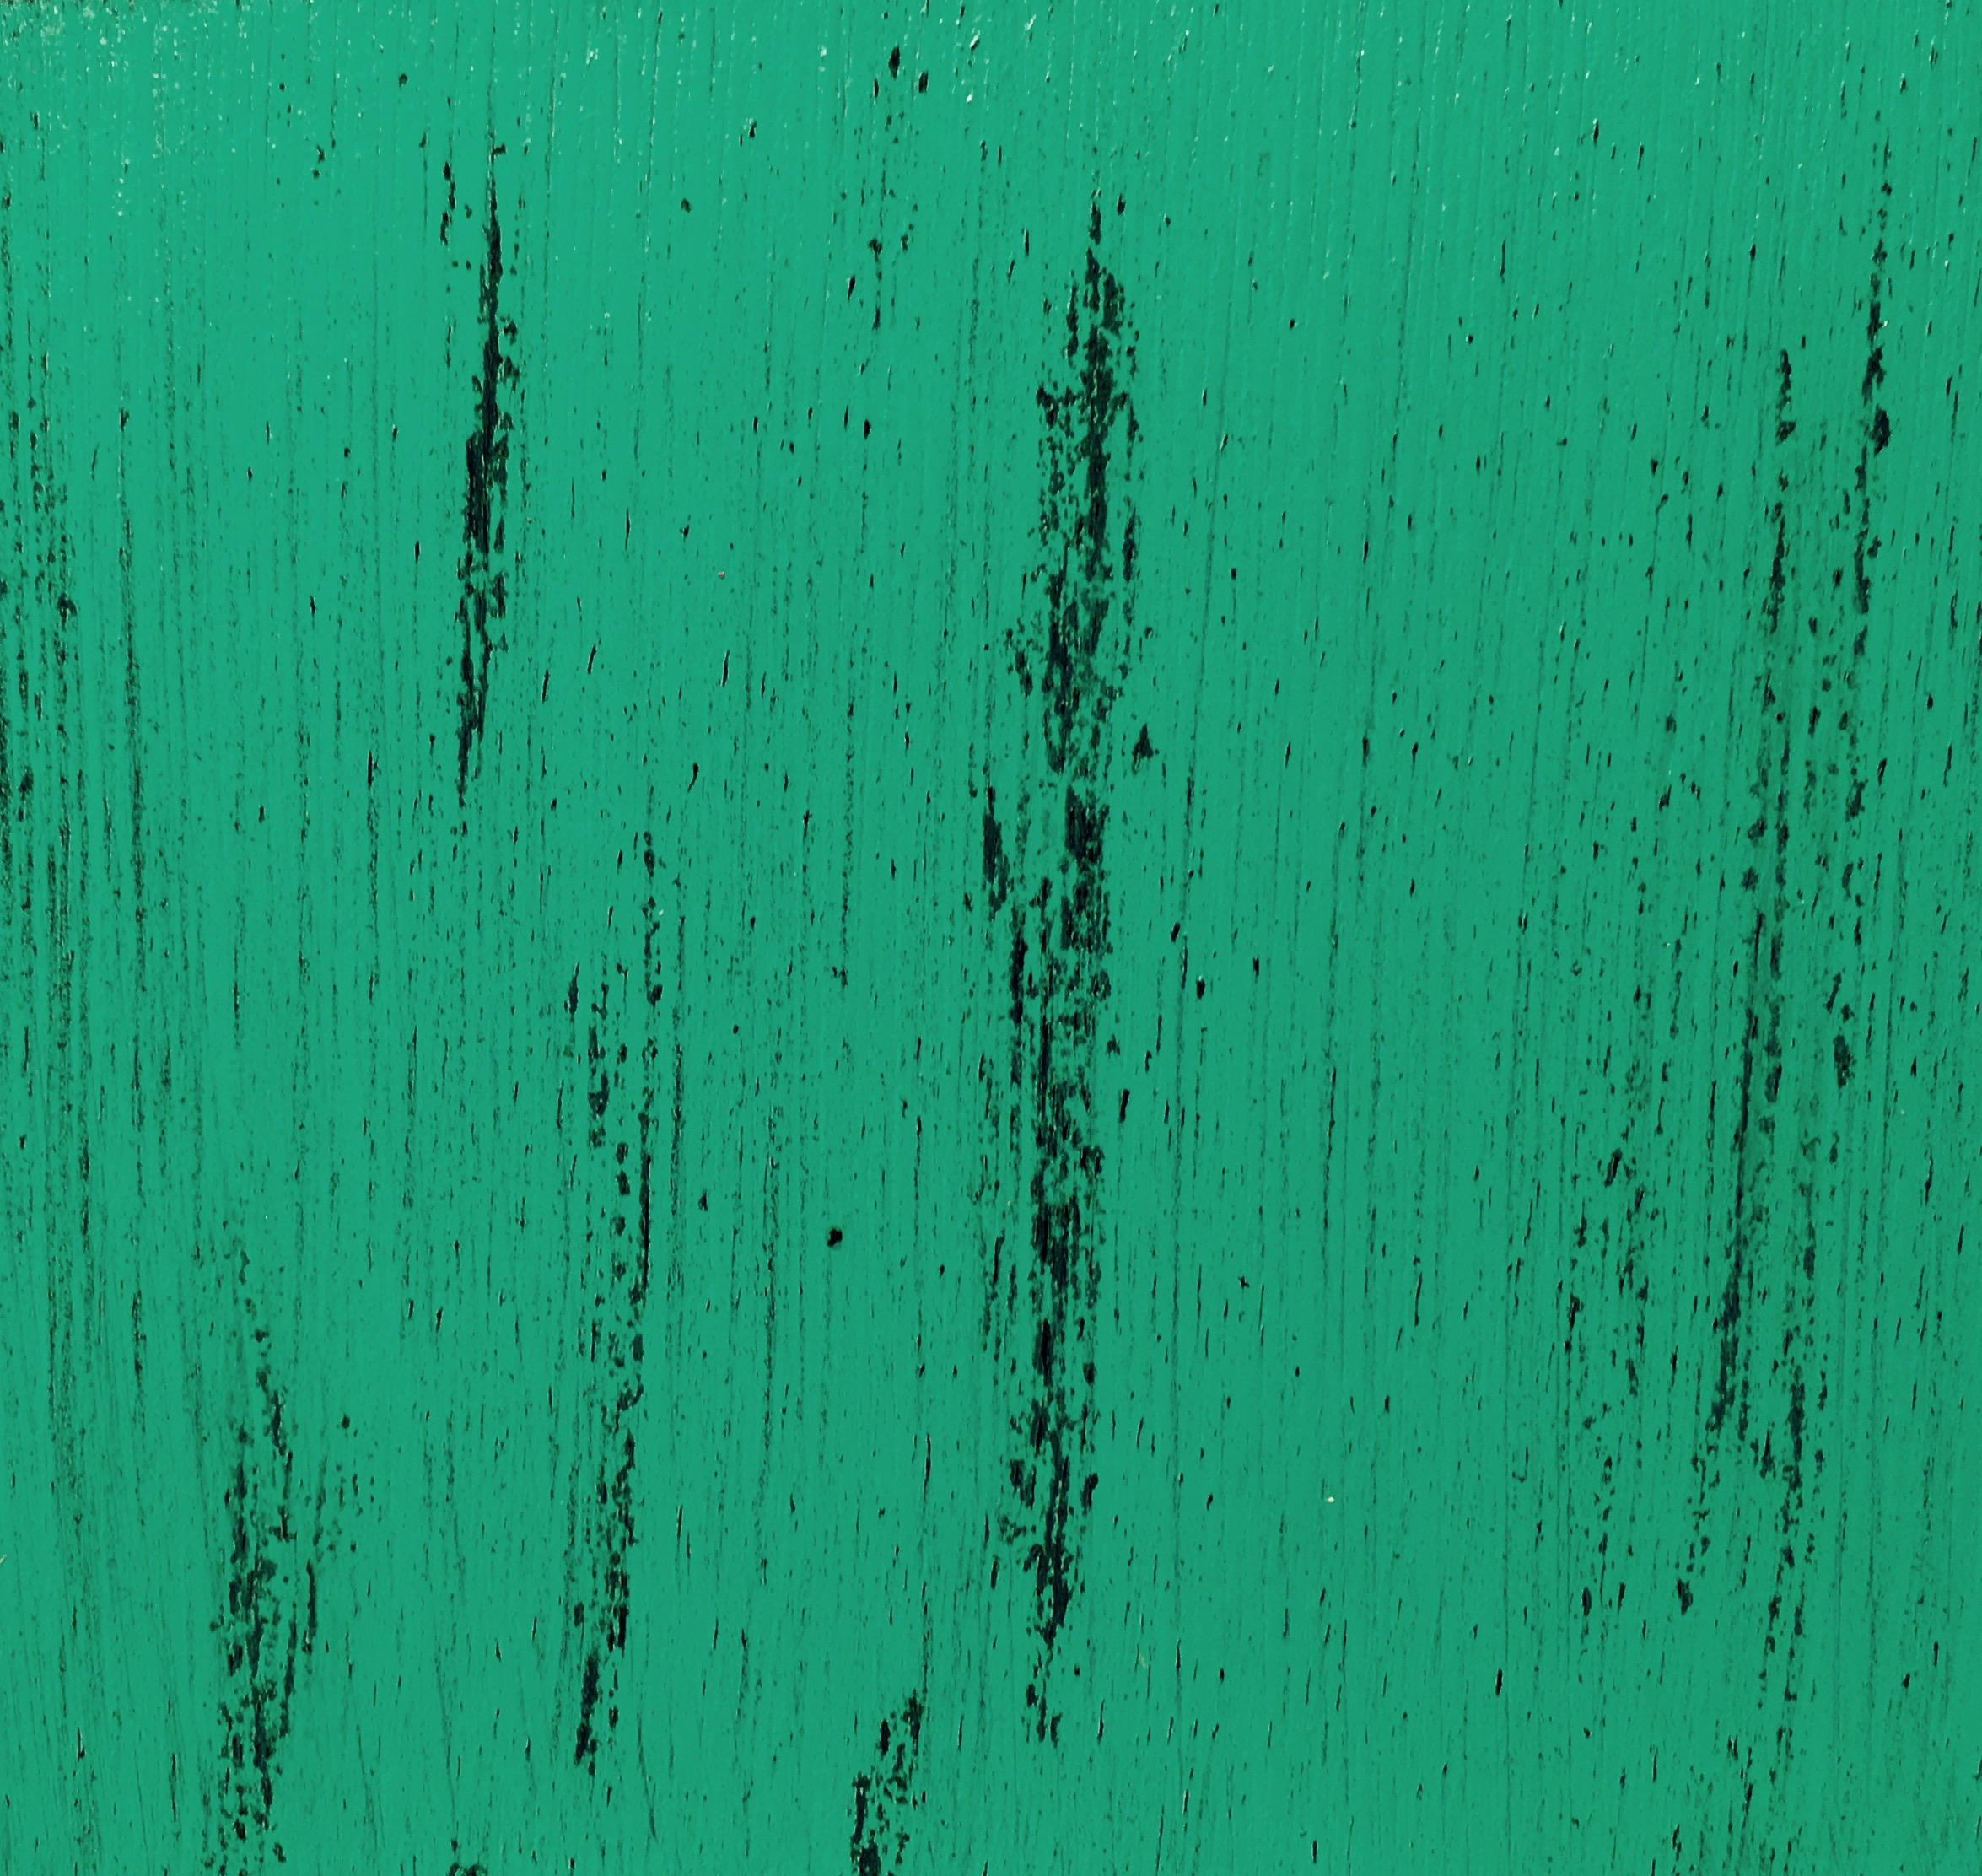 Verdigris green over Onyx black